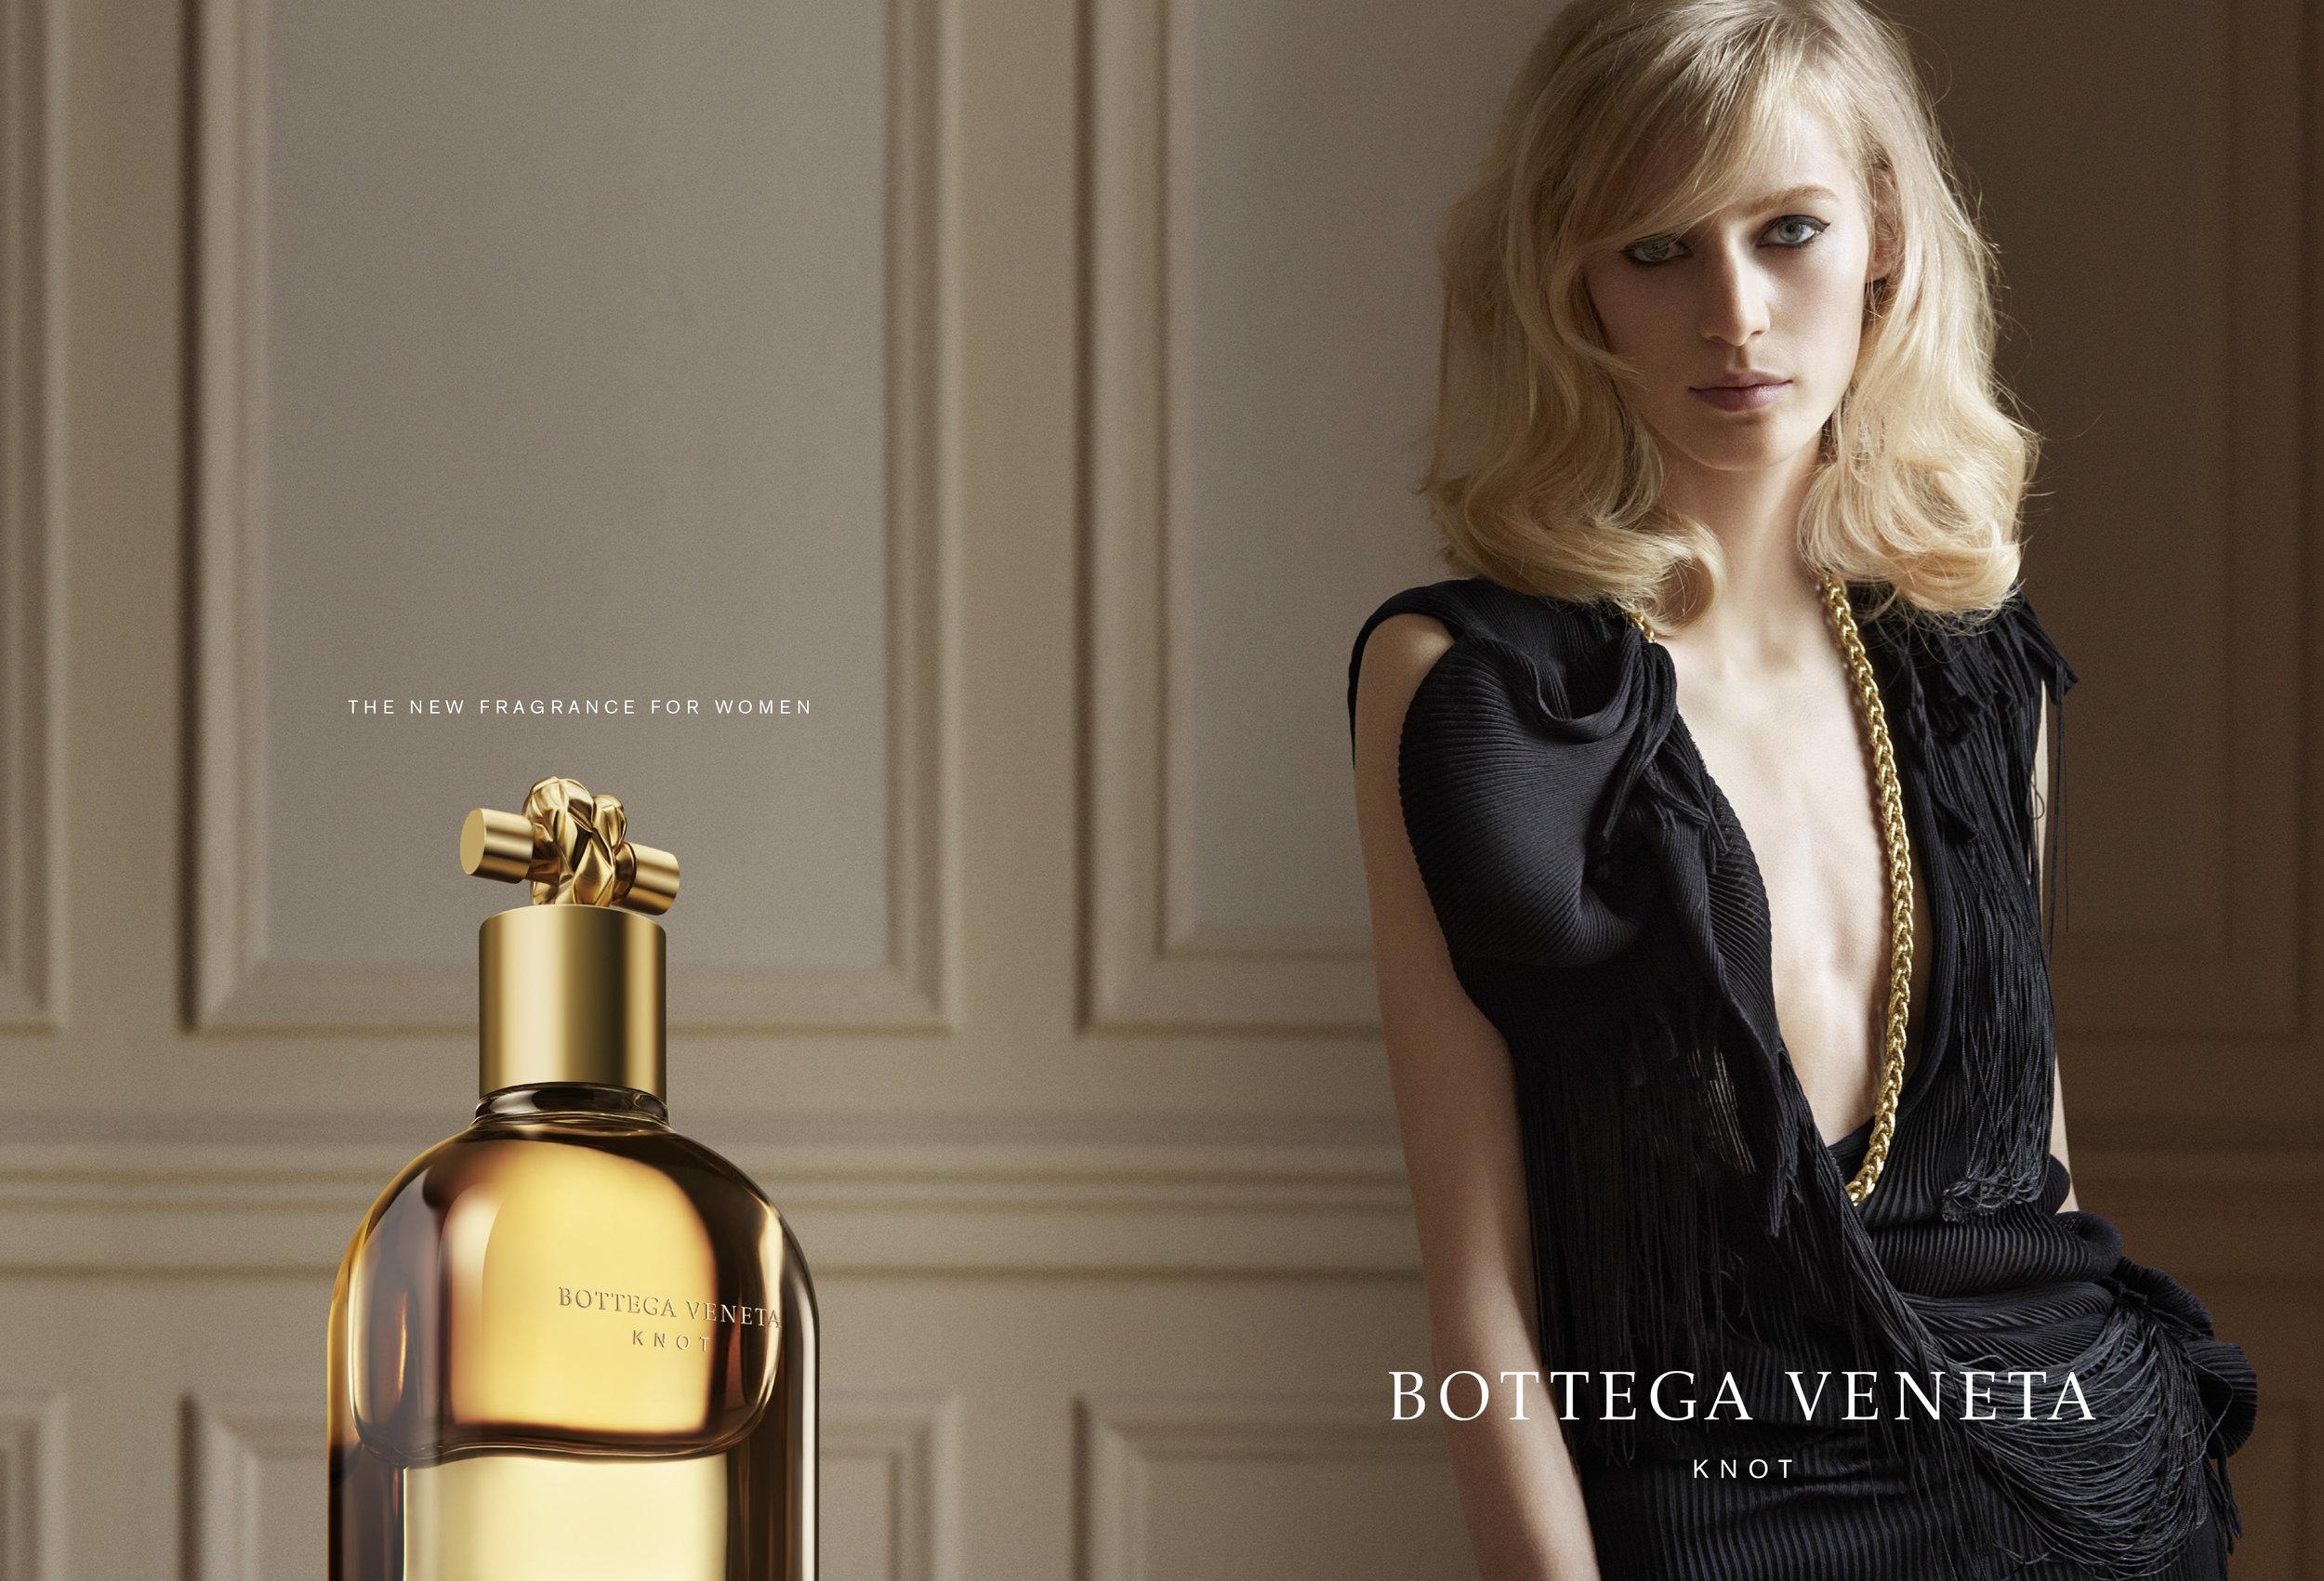 KNOT by BOTTEGA VENETA print campaign